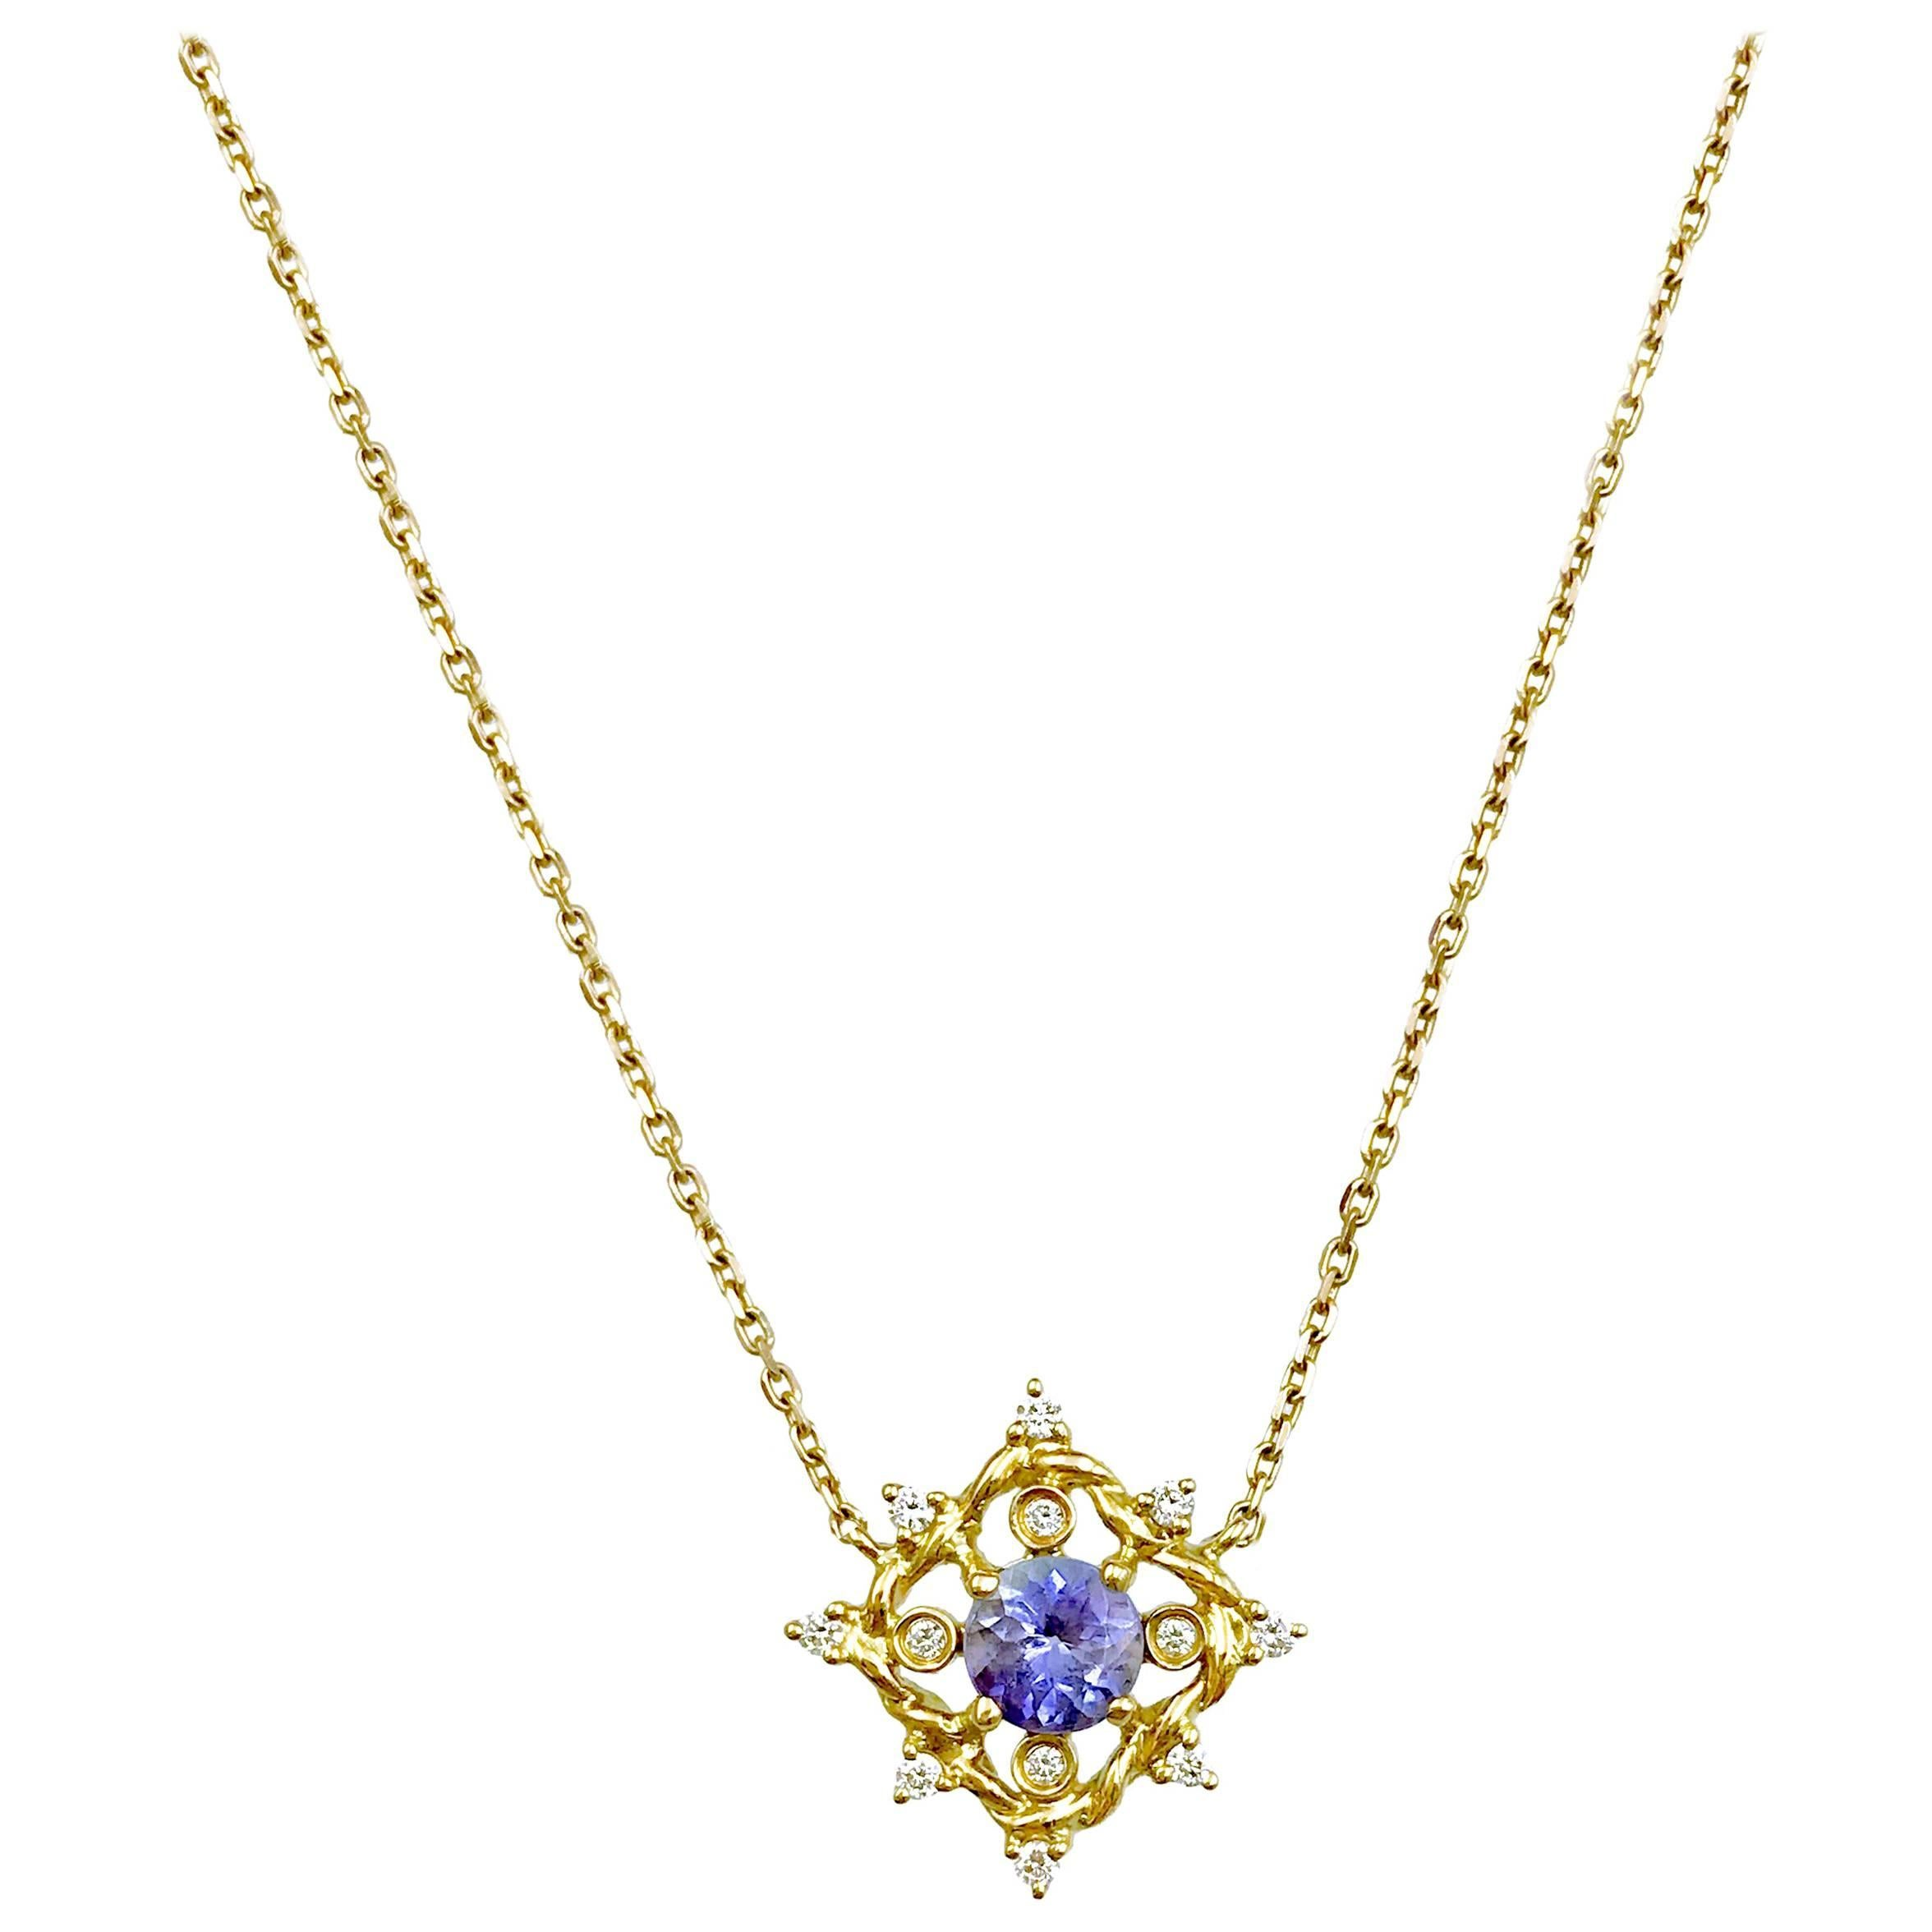 Ari Tanzanite Petite Pendant Necklace 14 Karat Gold 0.10 Carat Diamonds in Stock